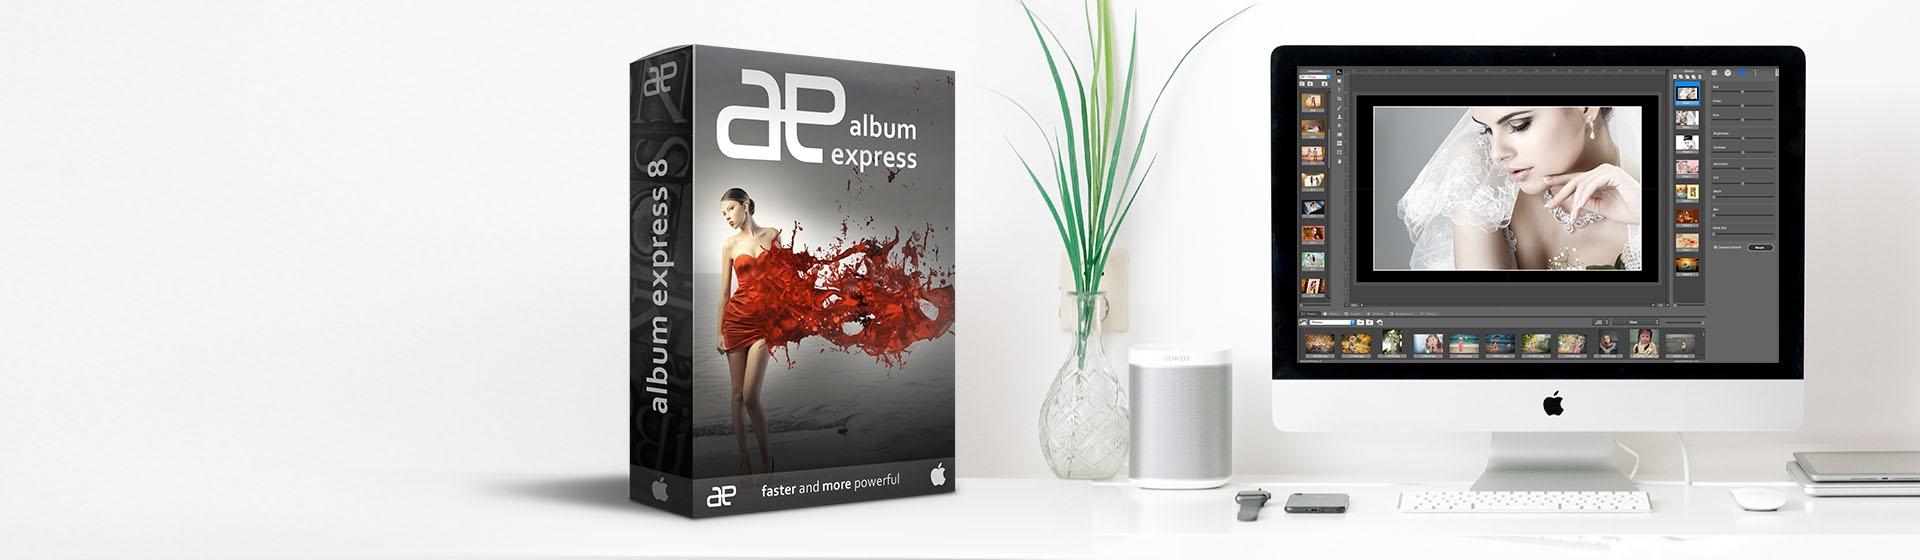 Album Express 8